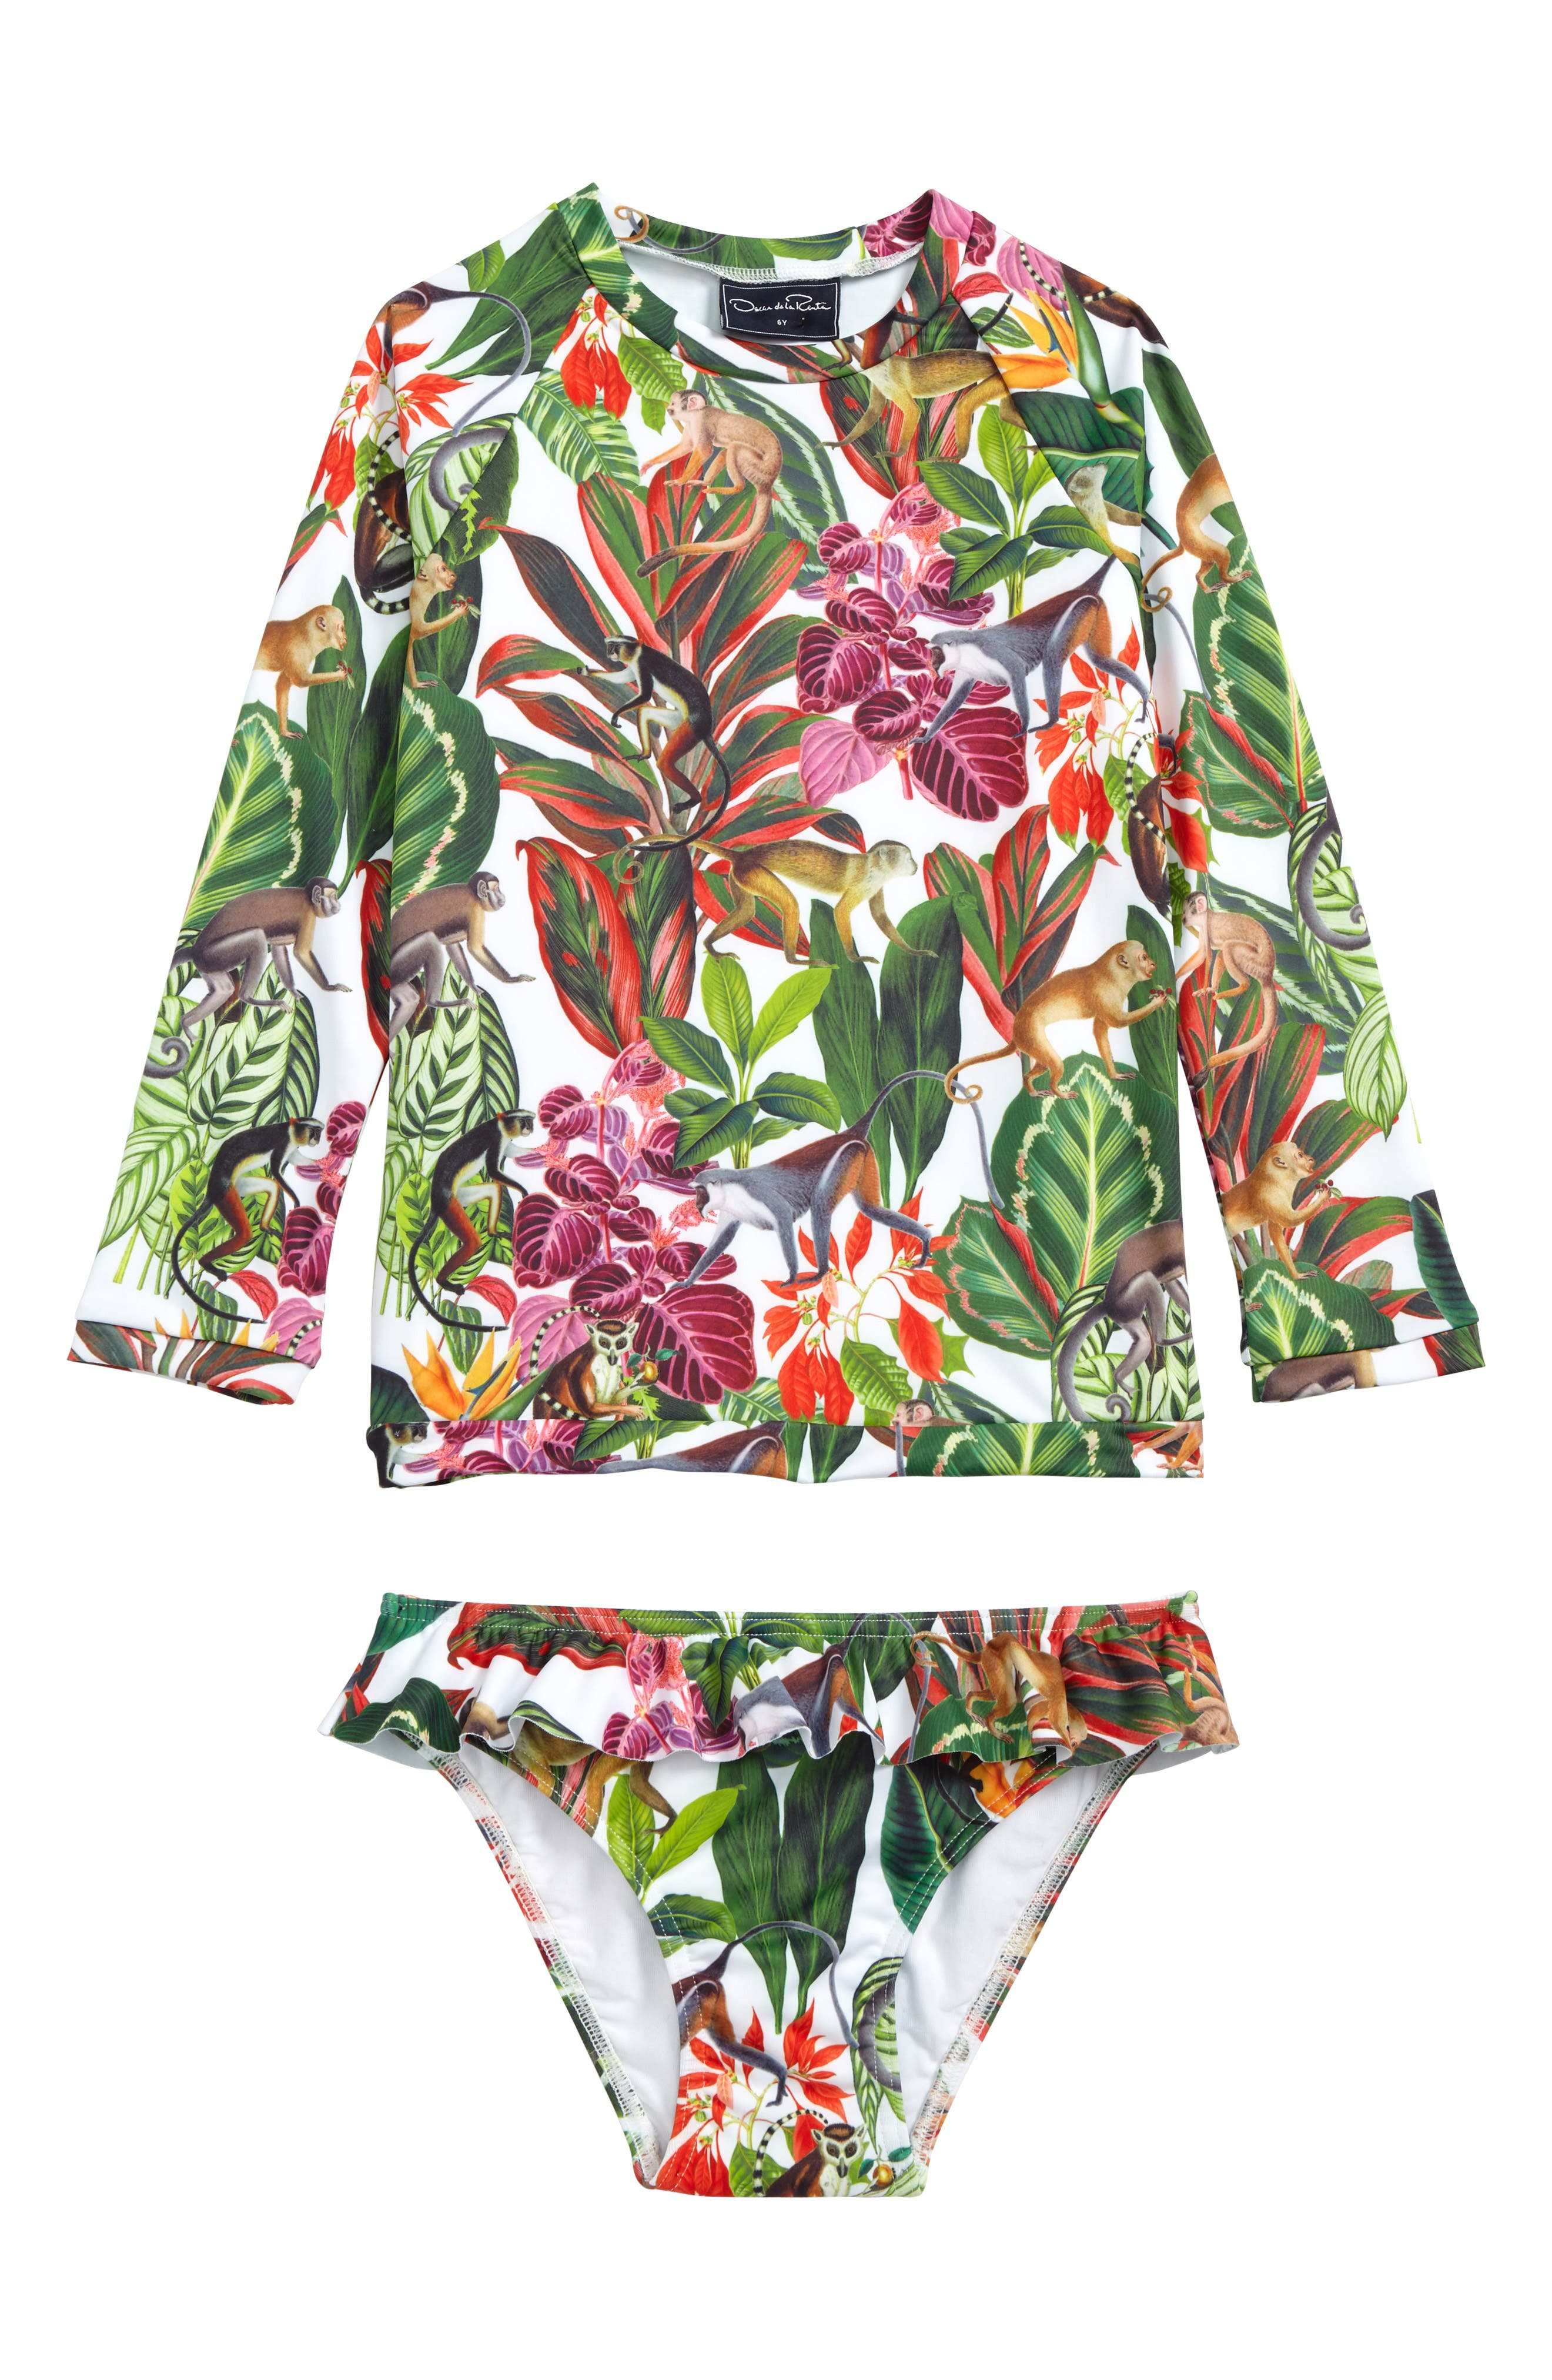 Alternate Image 1 Selected - Oscar de la Renta Jungle Monkeys Two-Piece Rashguard Swimsuit (Toddler Girls, Little Girls & Big Girls)